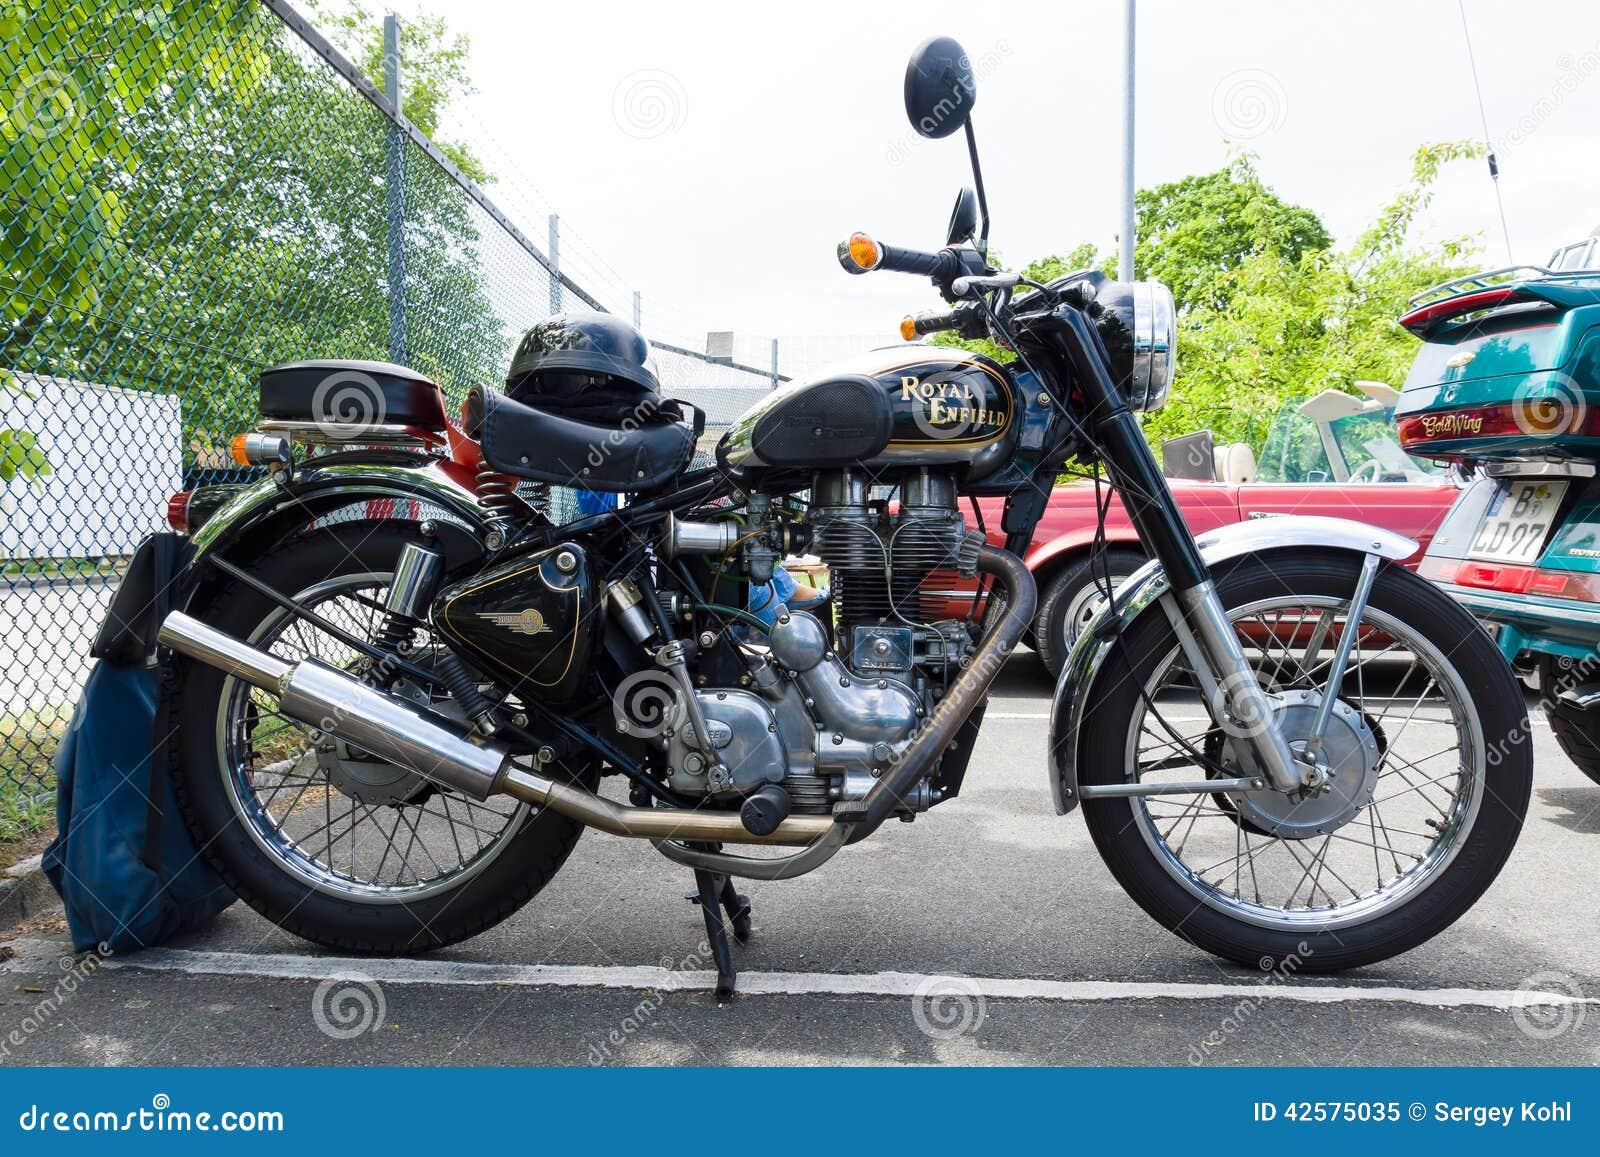 motorcycle royal enfield bullet 500 es editorial image image 42575035. Black Bedroom Furniture Sets. Home Design Ideas